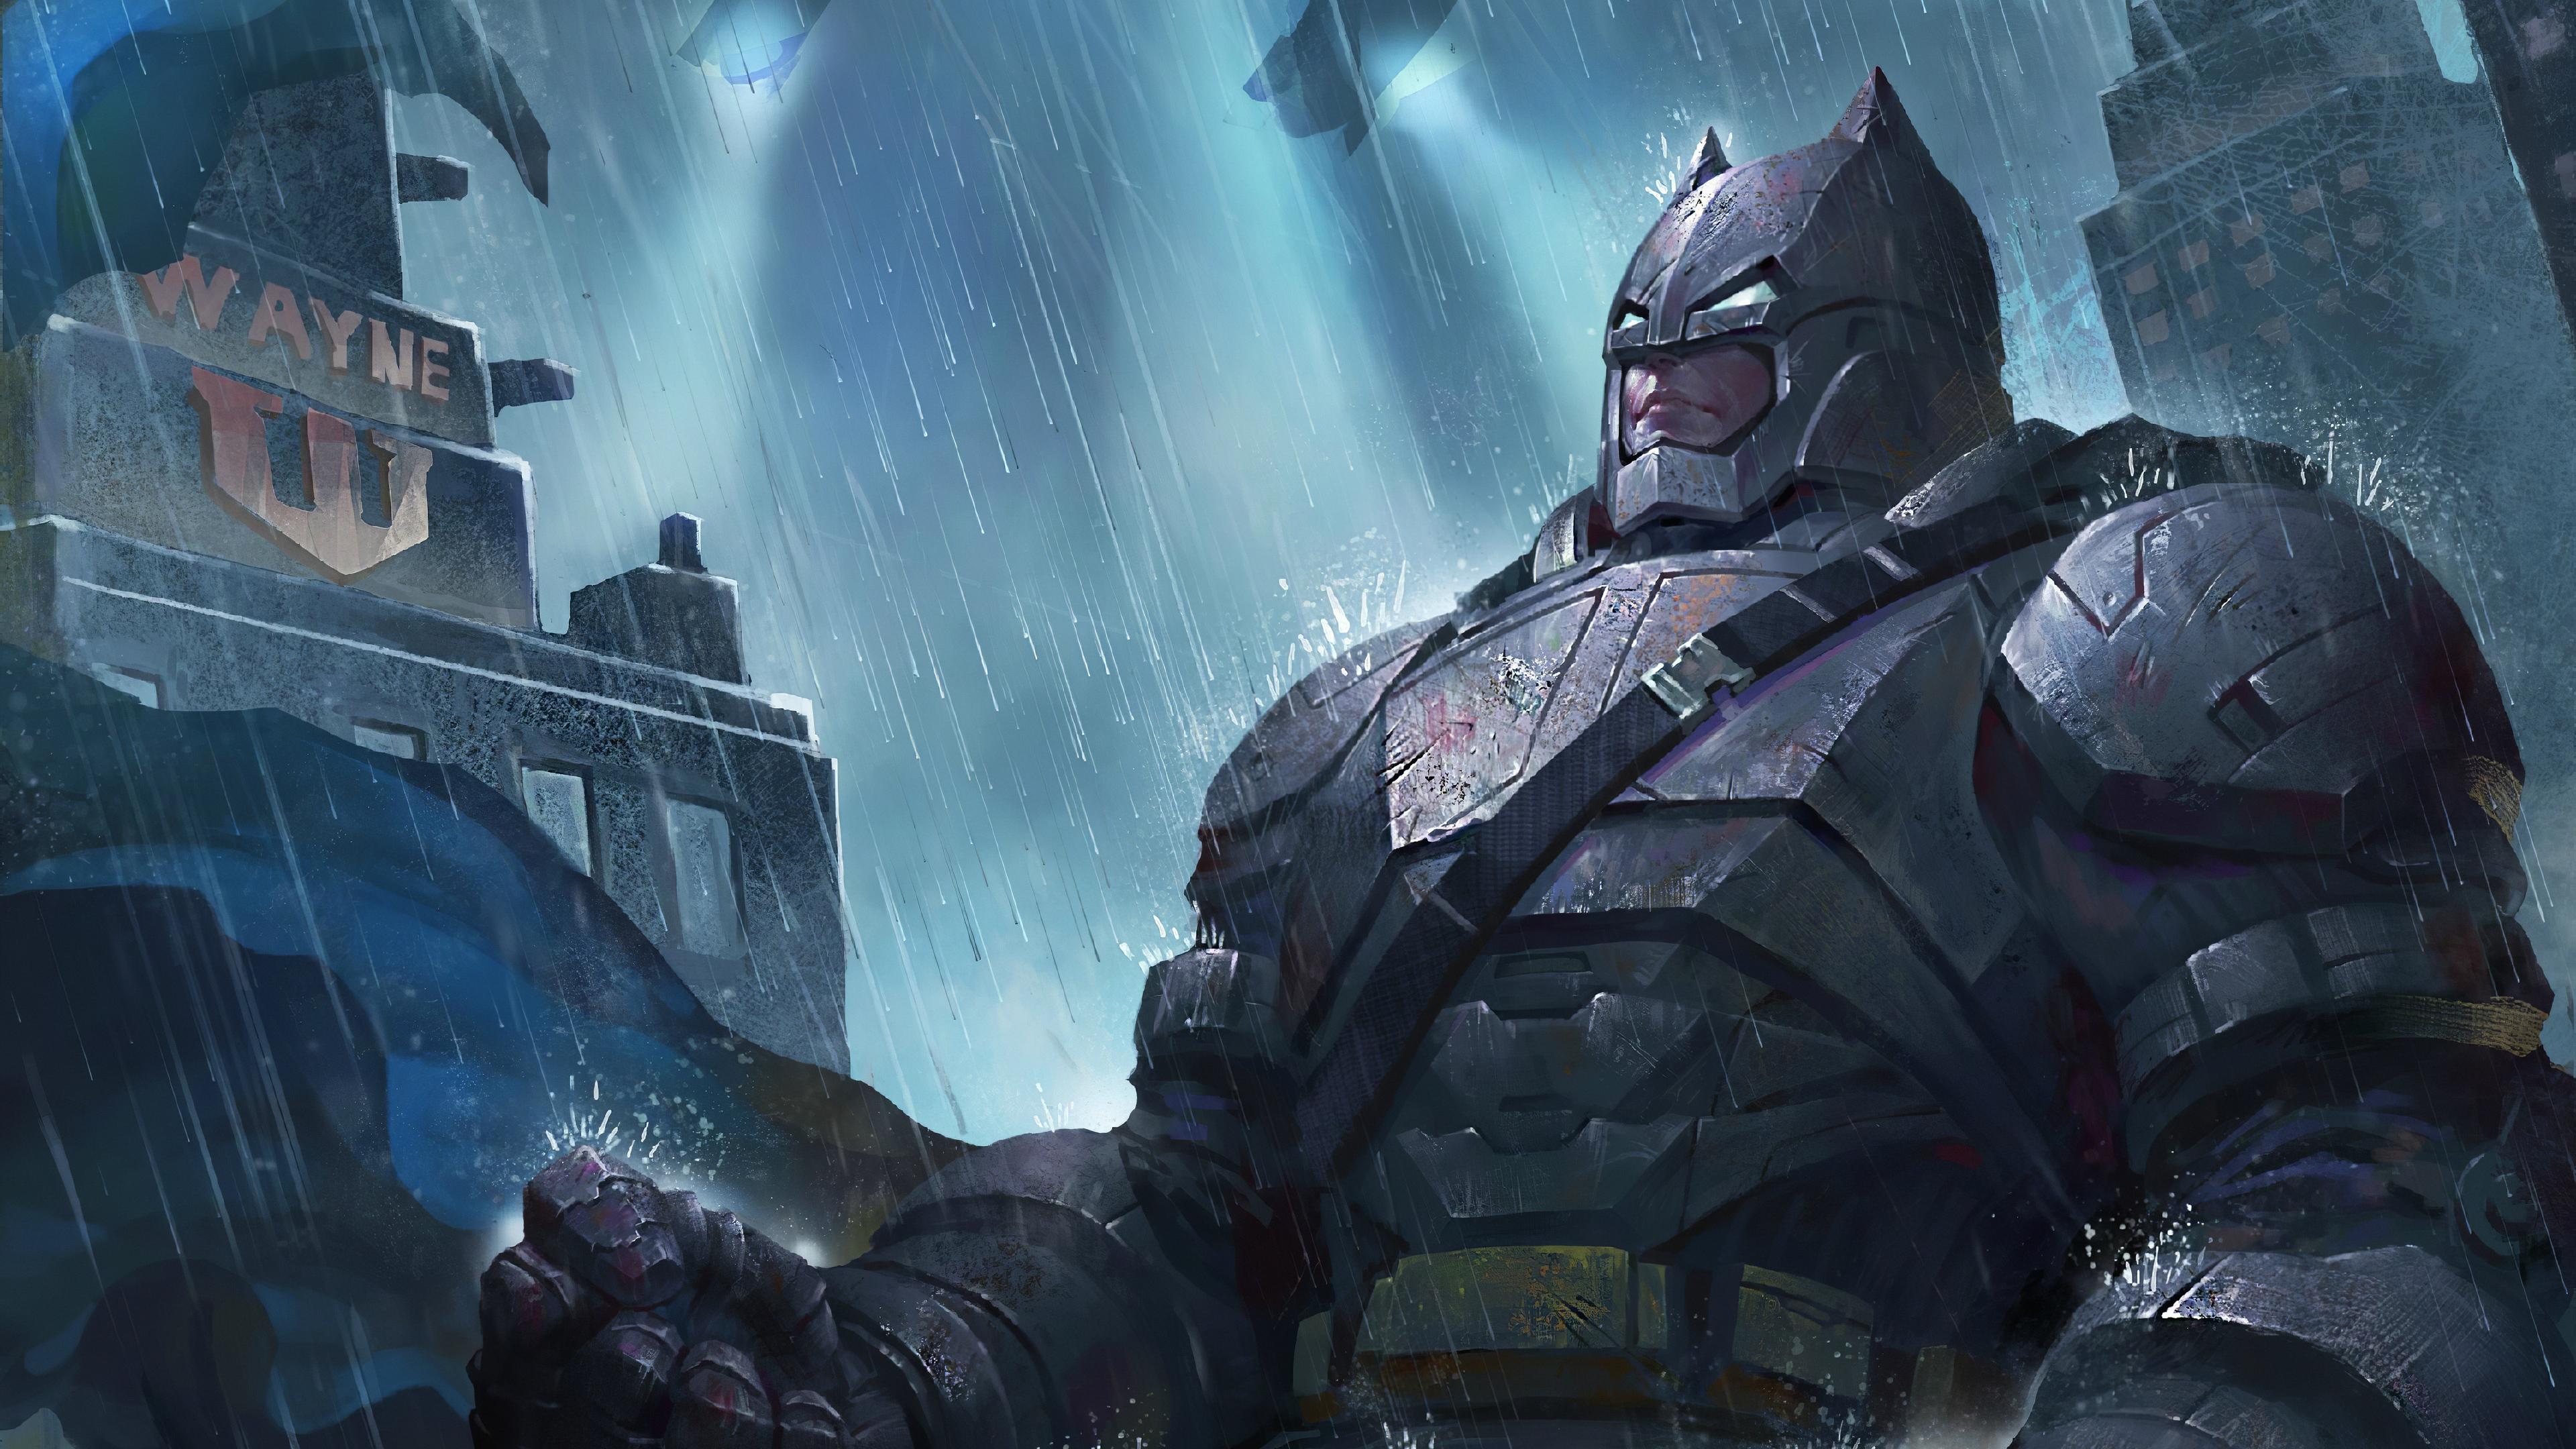 batman armored art 1580586015 - Batman Armored Art - Batman Armored wallpapers, Batman Armored phone wallpapers, Batman Armored 4k wallpapers